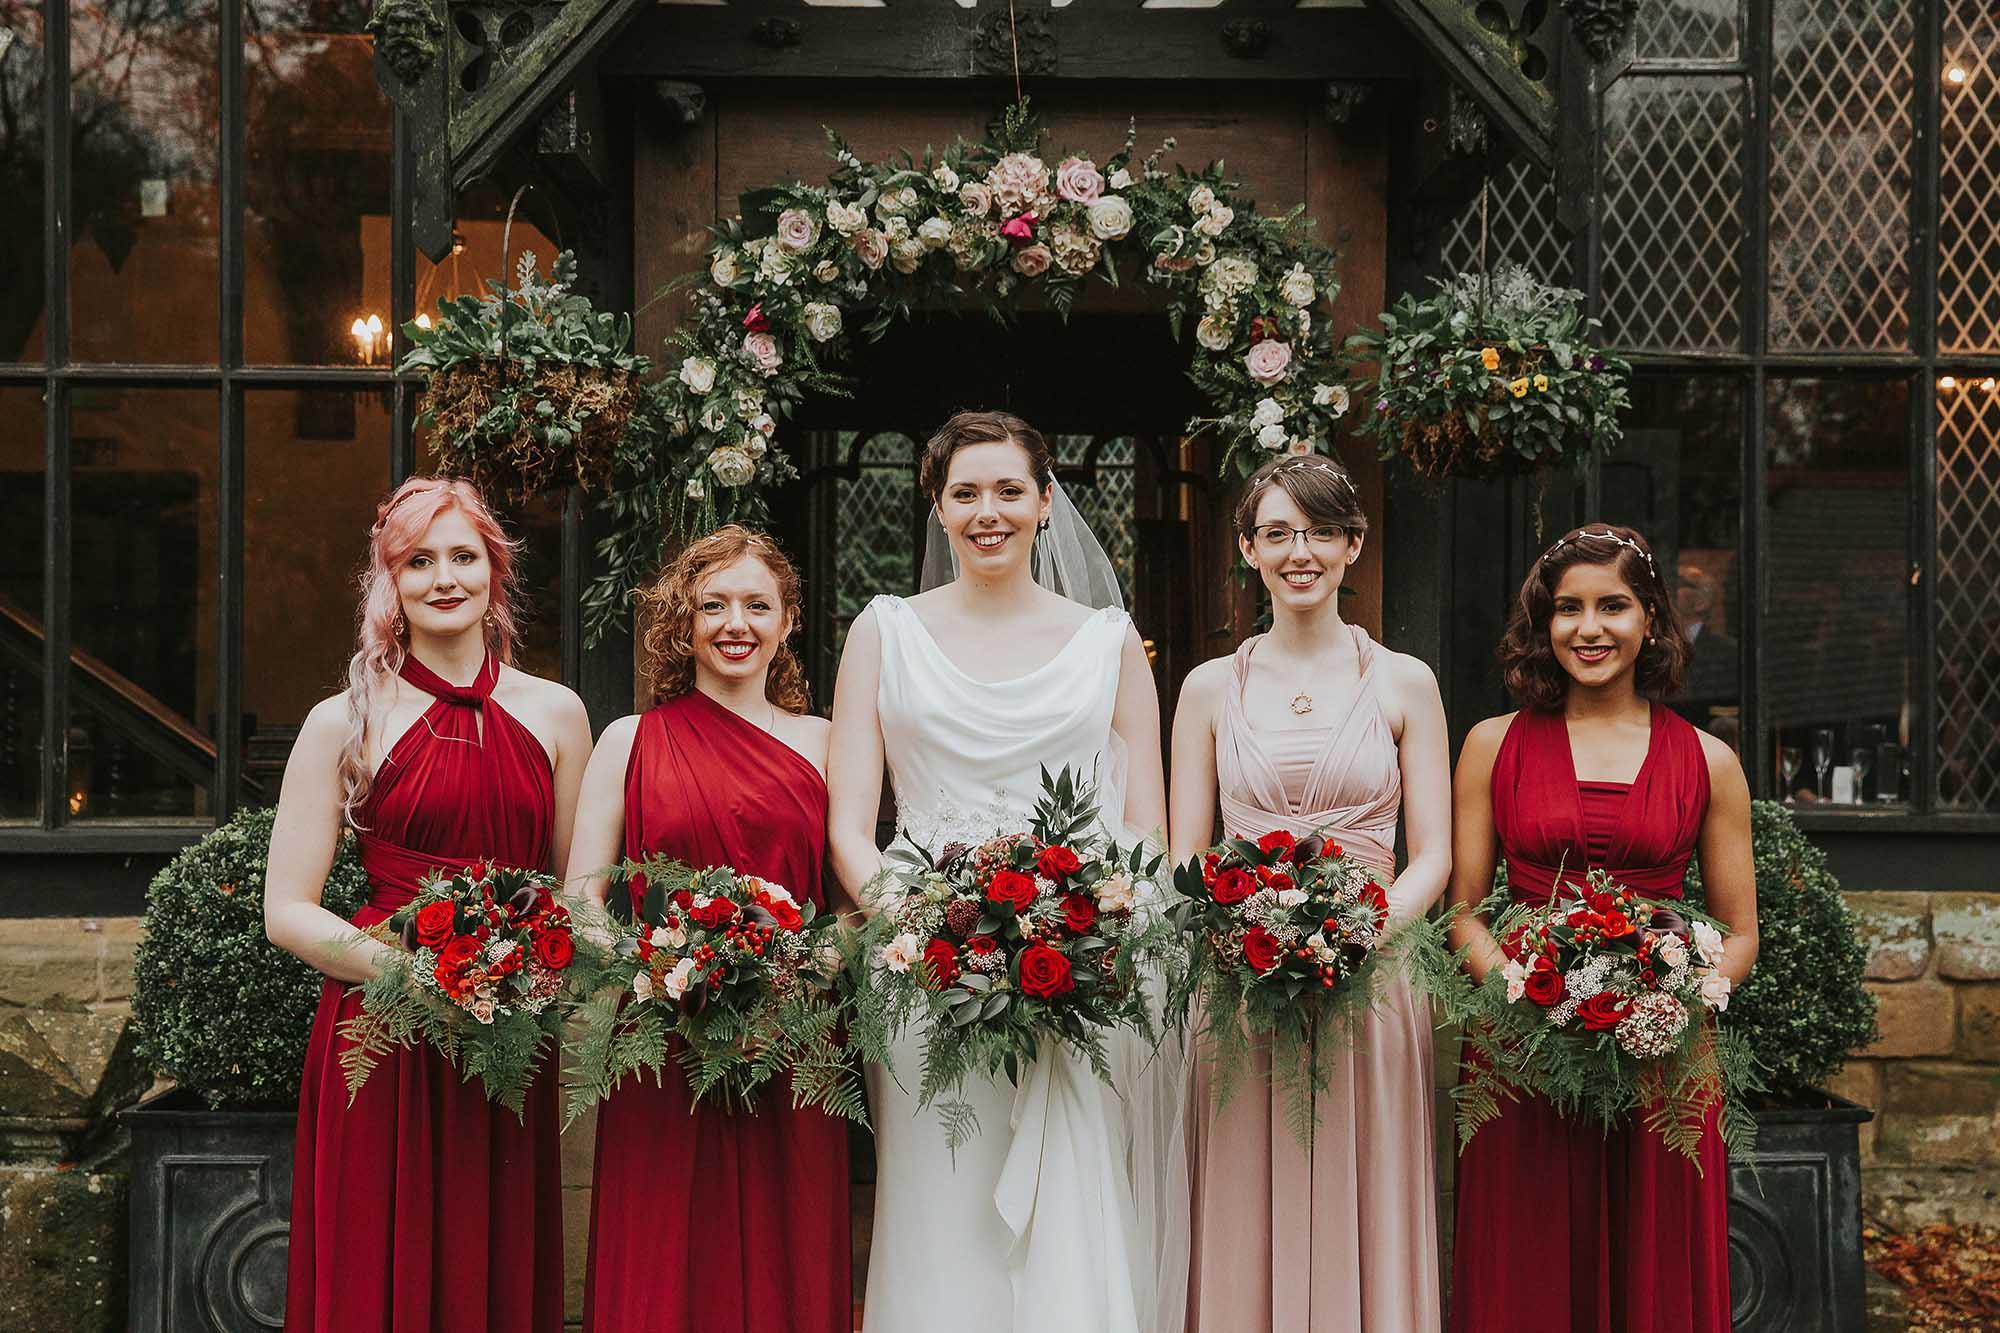 Samlesbury Hall wedding photography